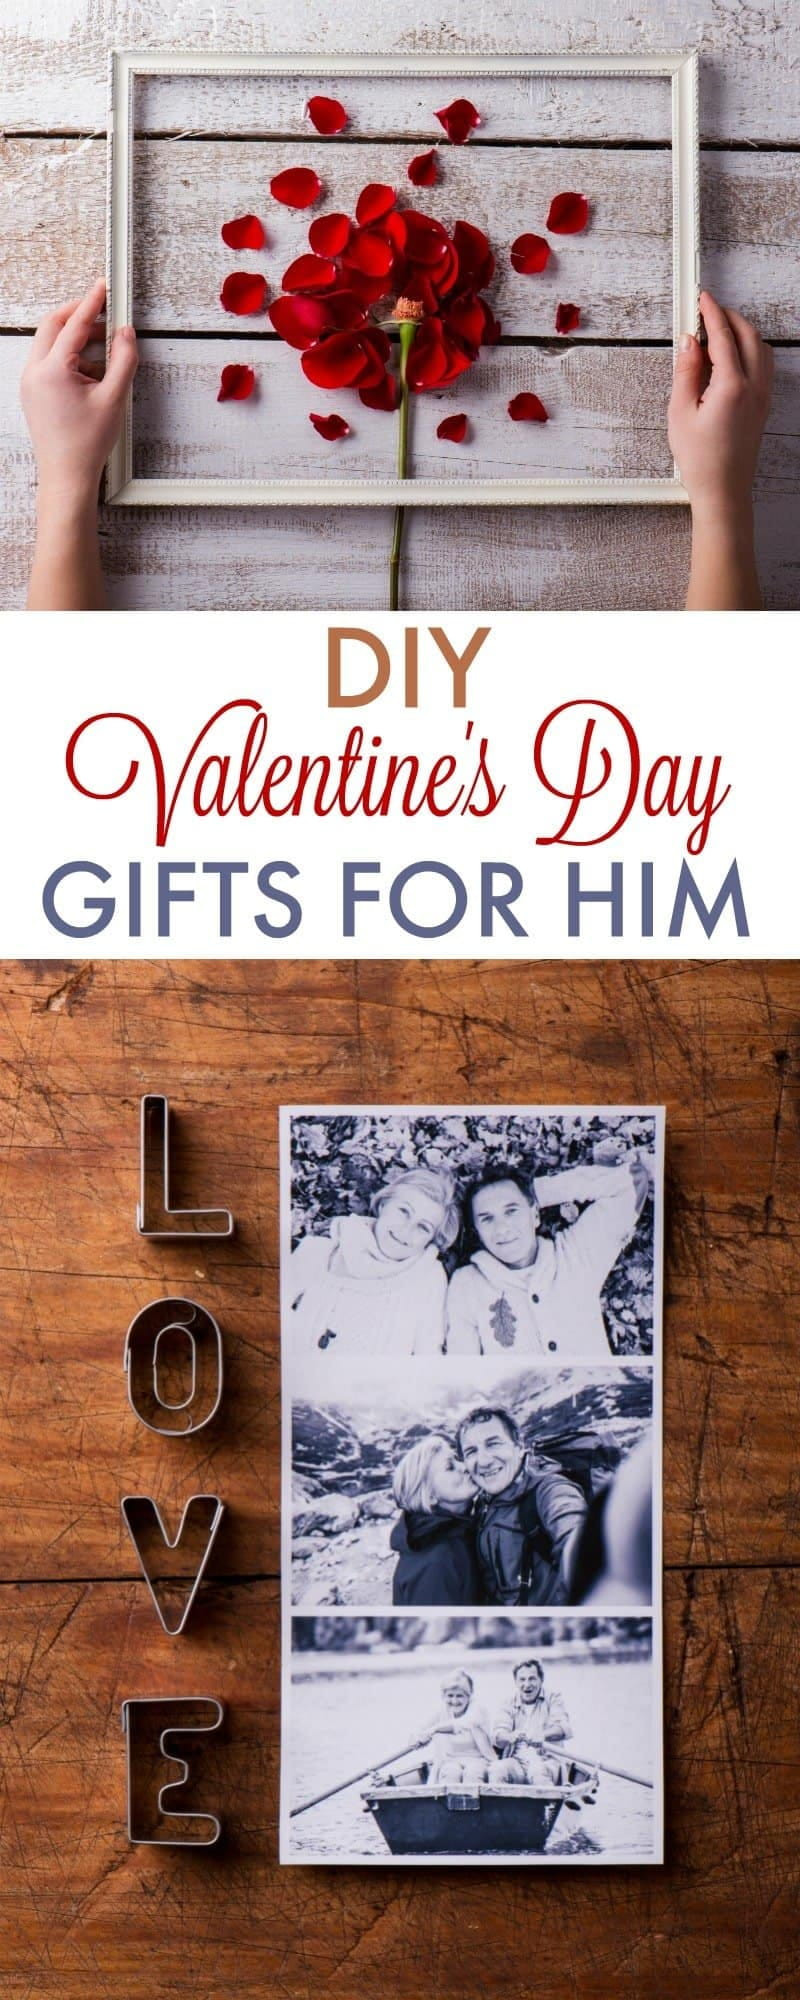 Cute DIY Gifts For Boyfriend  DIY Valentine s Day Gifts for Boyfriend 730 Sage Street